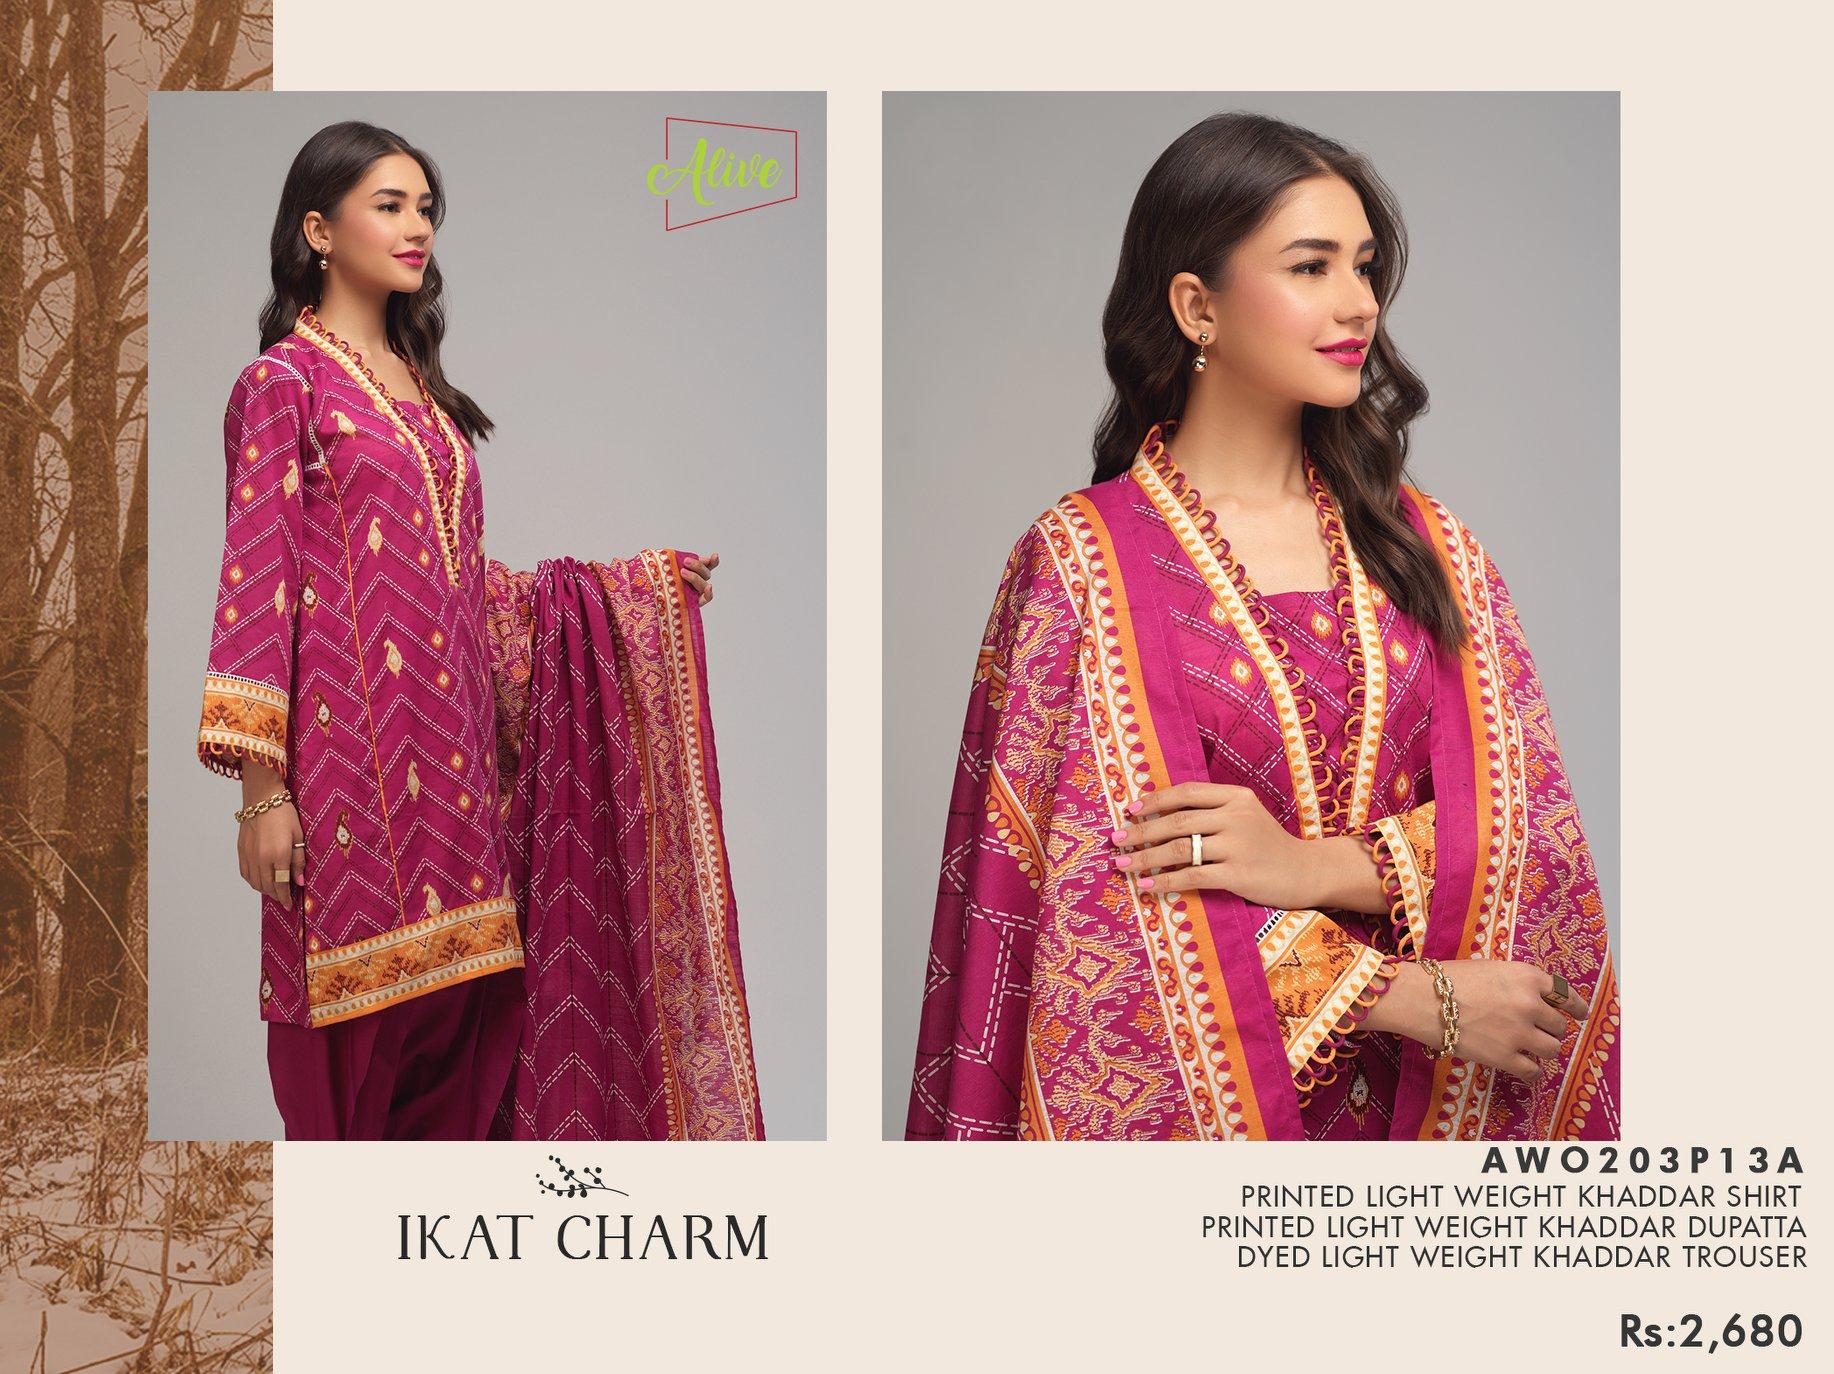 Bonanza Satrangi Ikat Charm Winter Dresses 2021